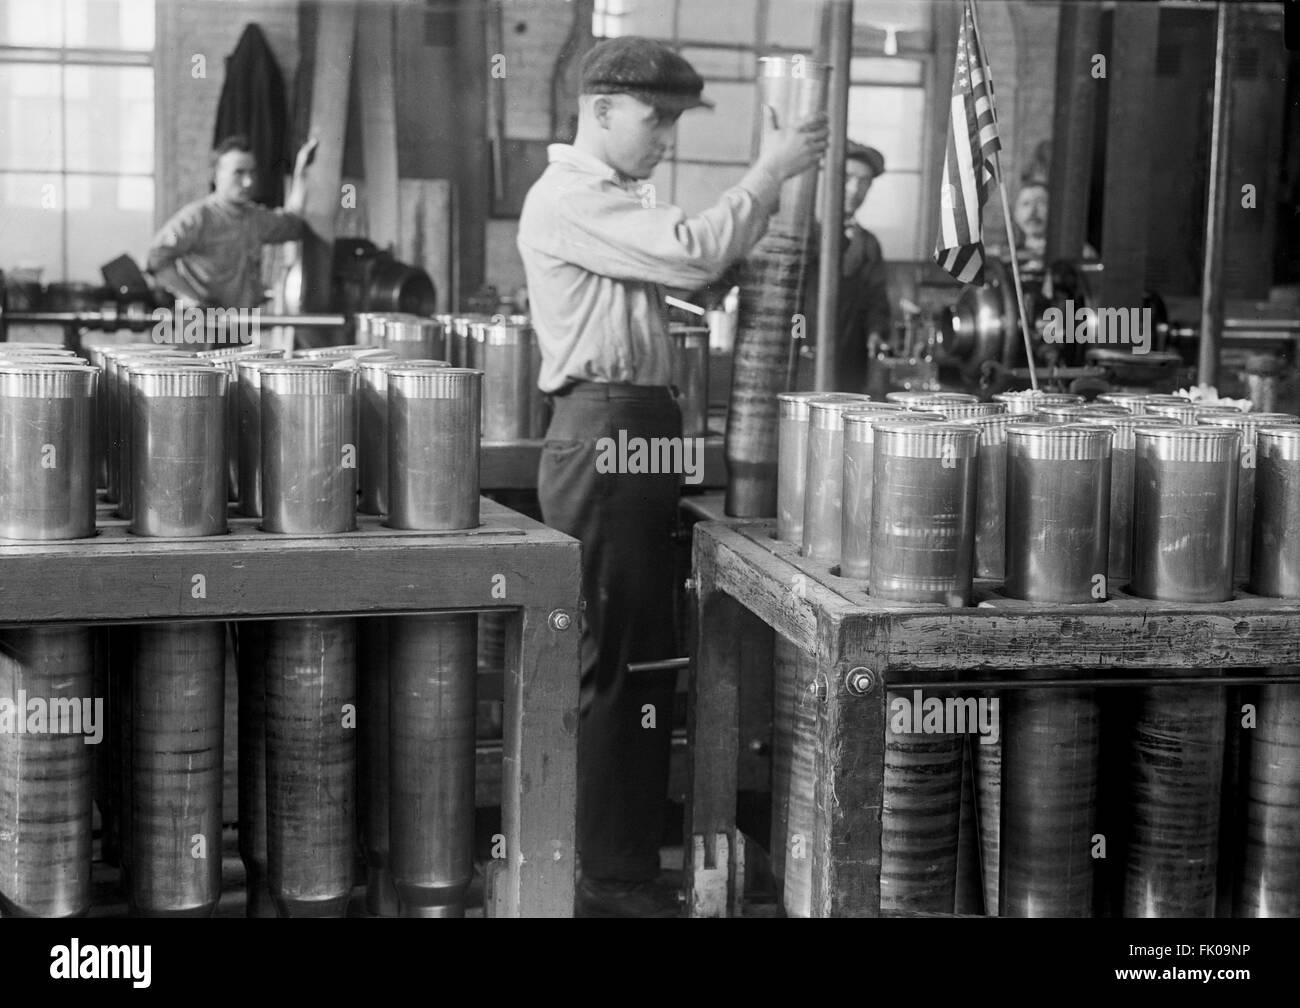 Worker Handling and Packing Cartridge Cases, Navy Yard, Washington DC, USA, 1917 Stock Photo